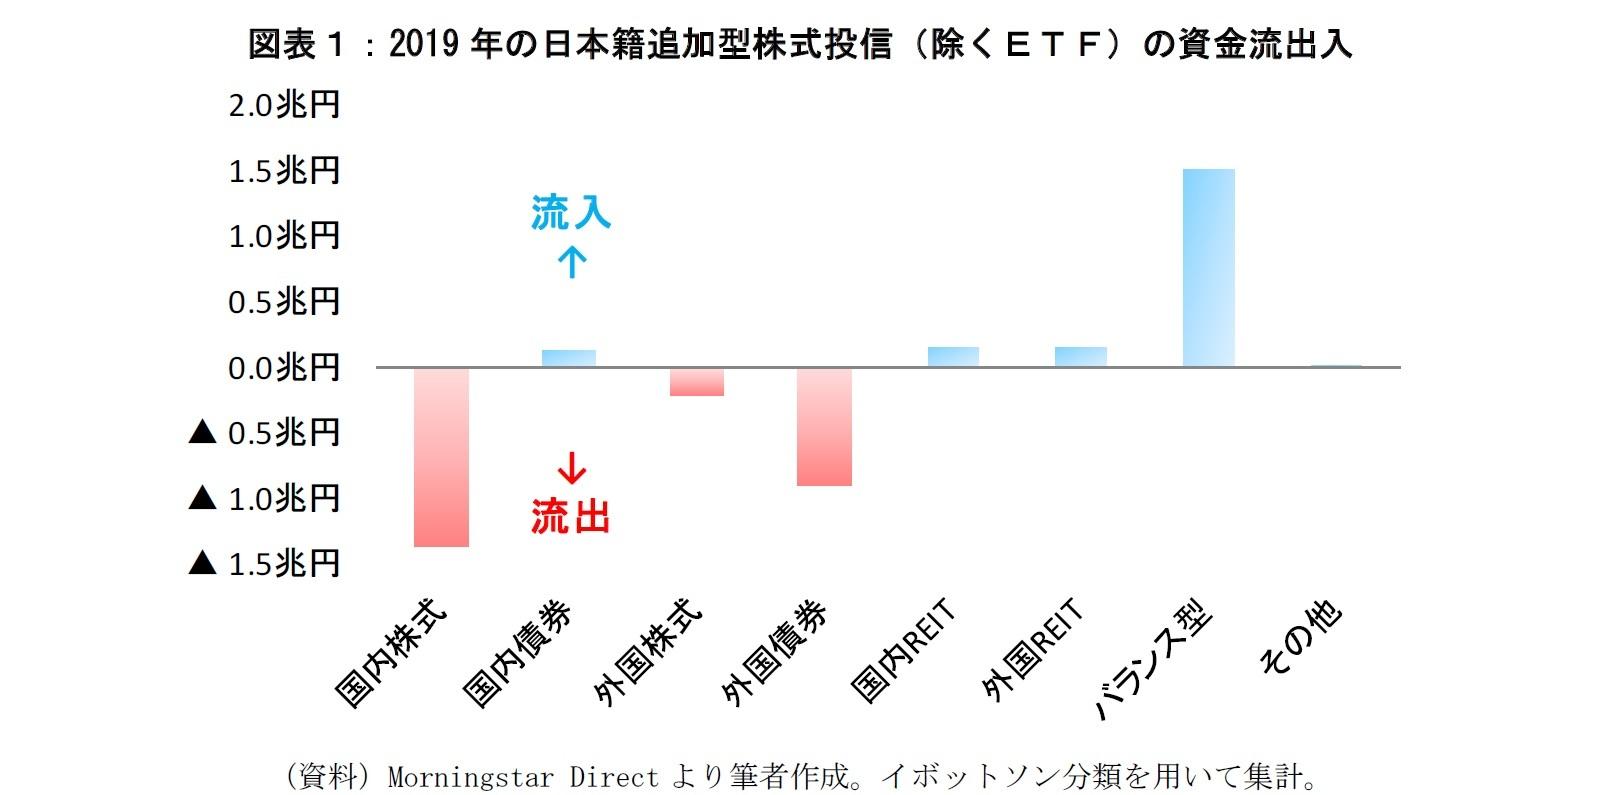 図表1:2019年の日本籍追加型株式投信の資金流出入